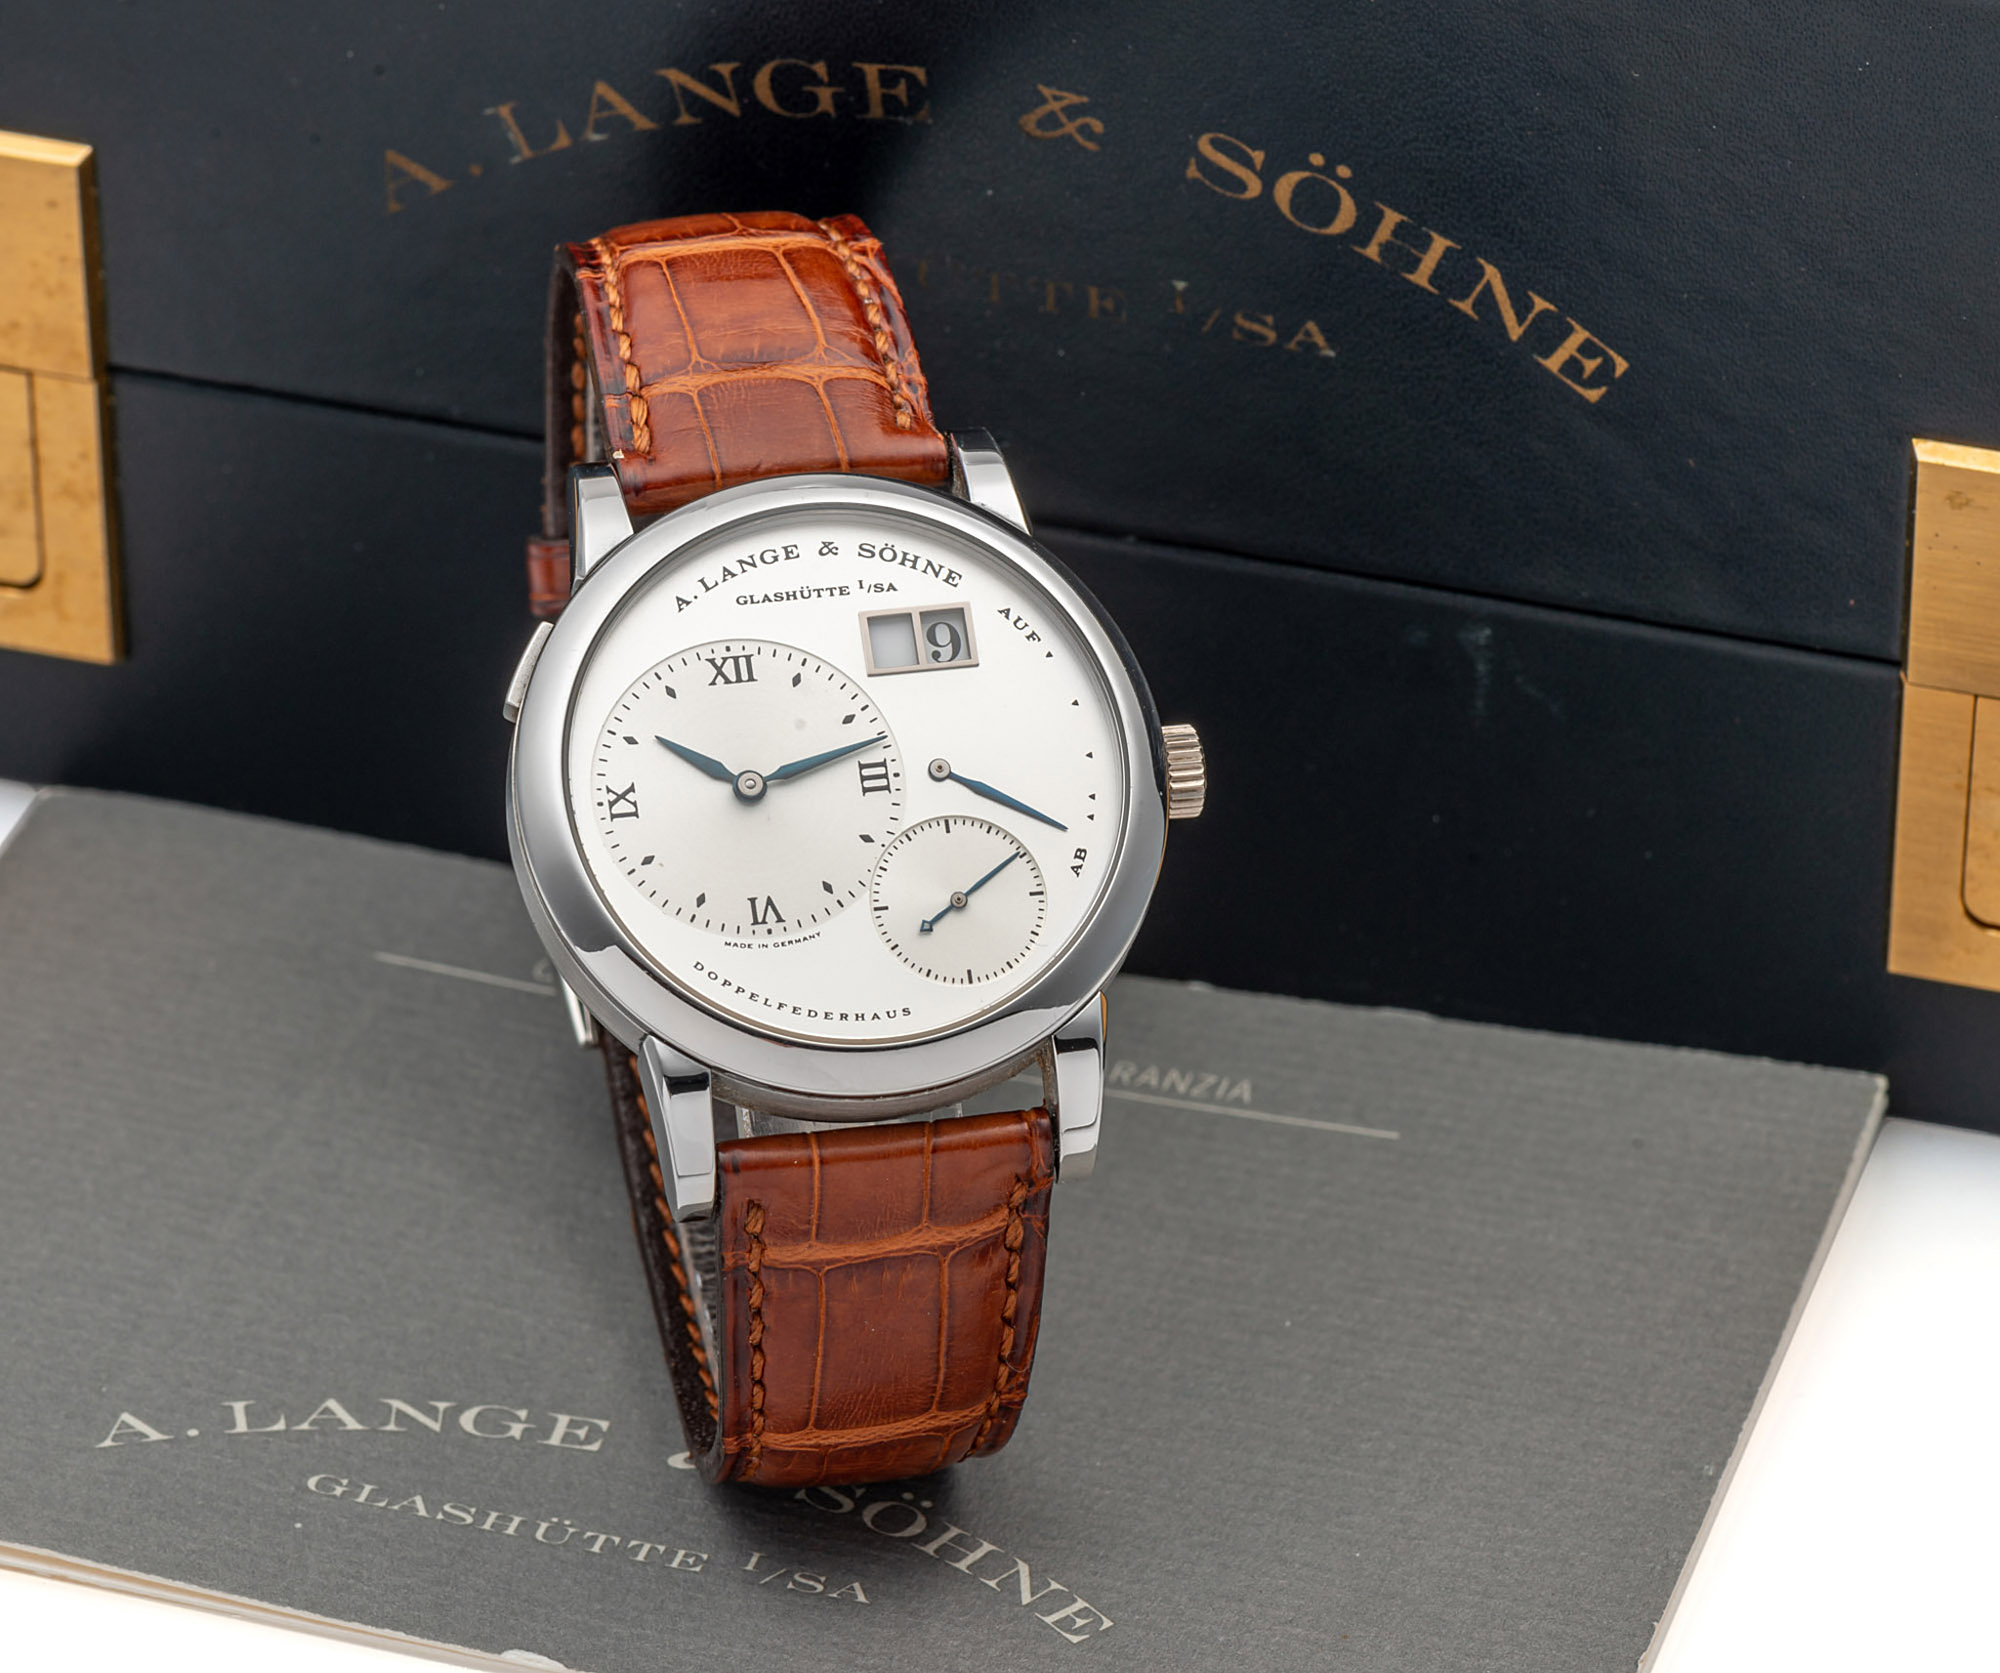 A. Lange & Söhne Lange 1 Stainless Steel